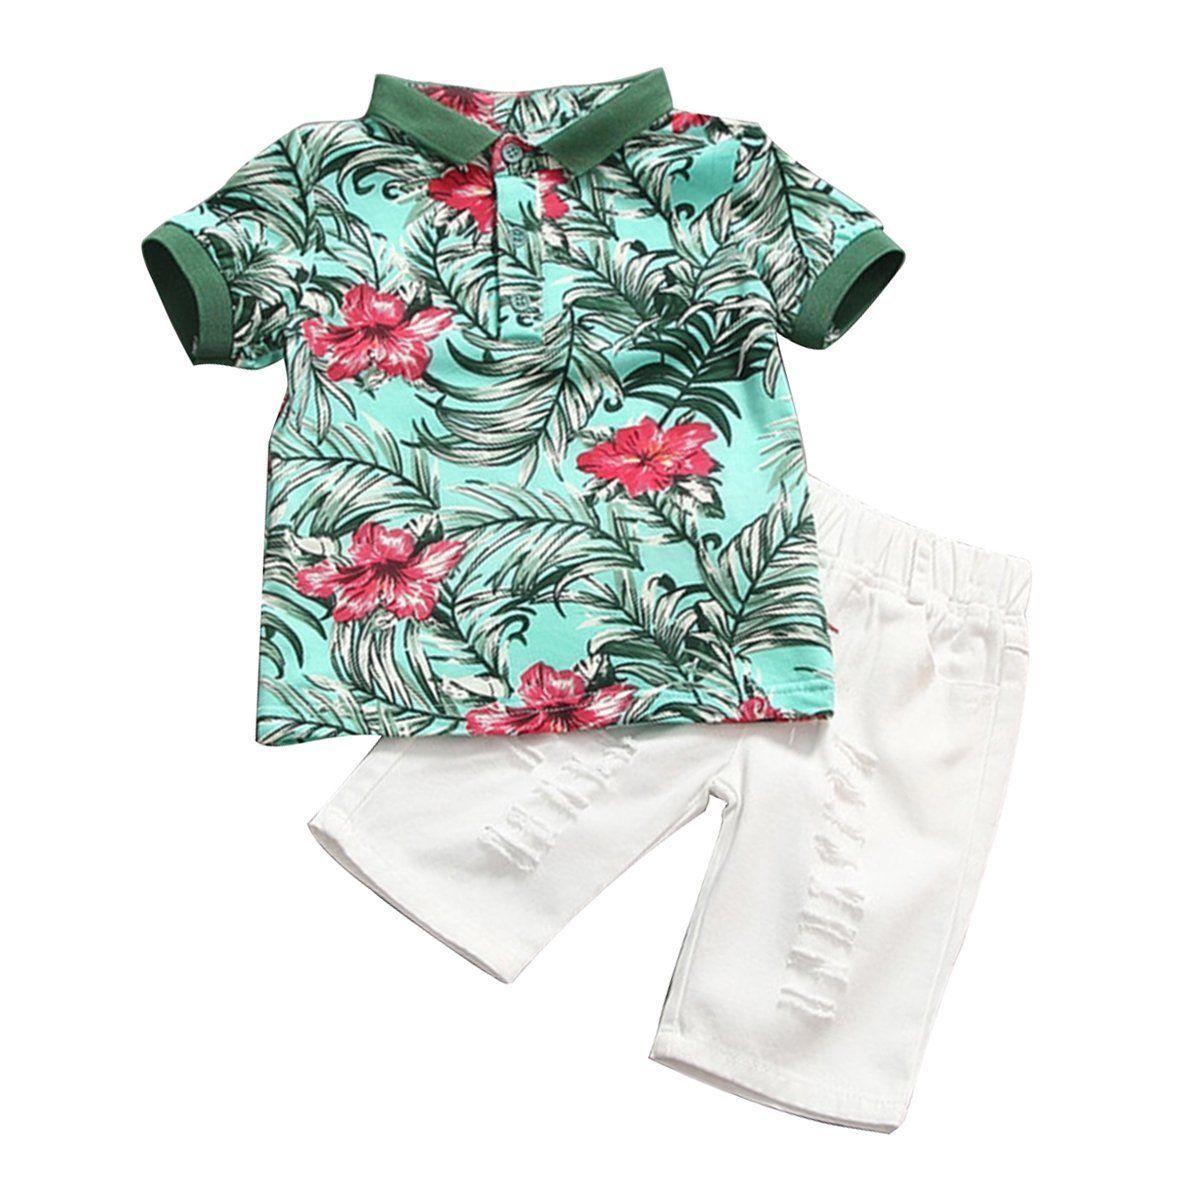 Grosir Boys White Beach Shirt Gallery Buy Low Price Kaos Pria Lengan Pendek Cabanna Black Floral Lots On Aliexpresscom